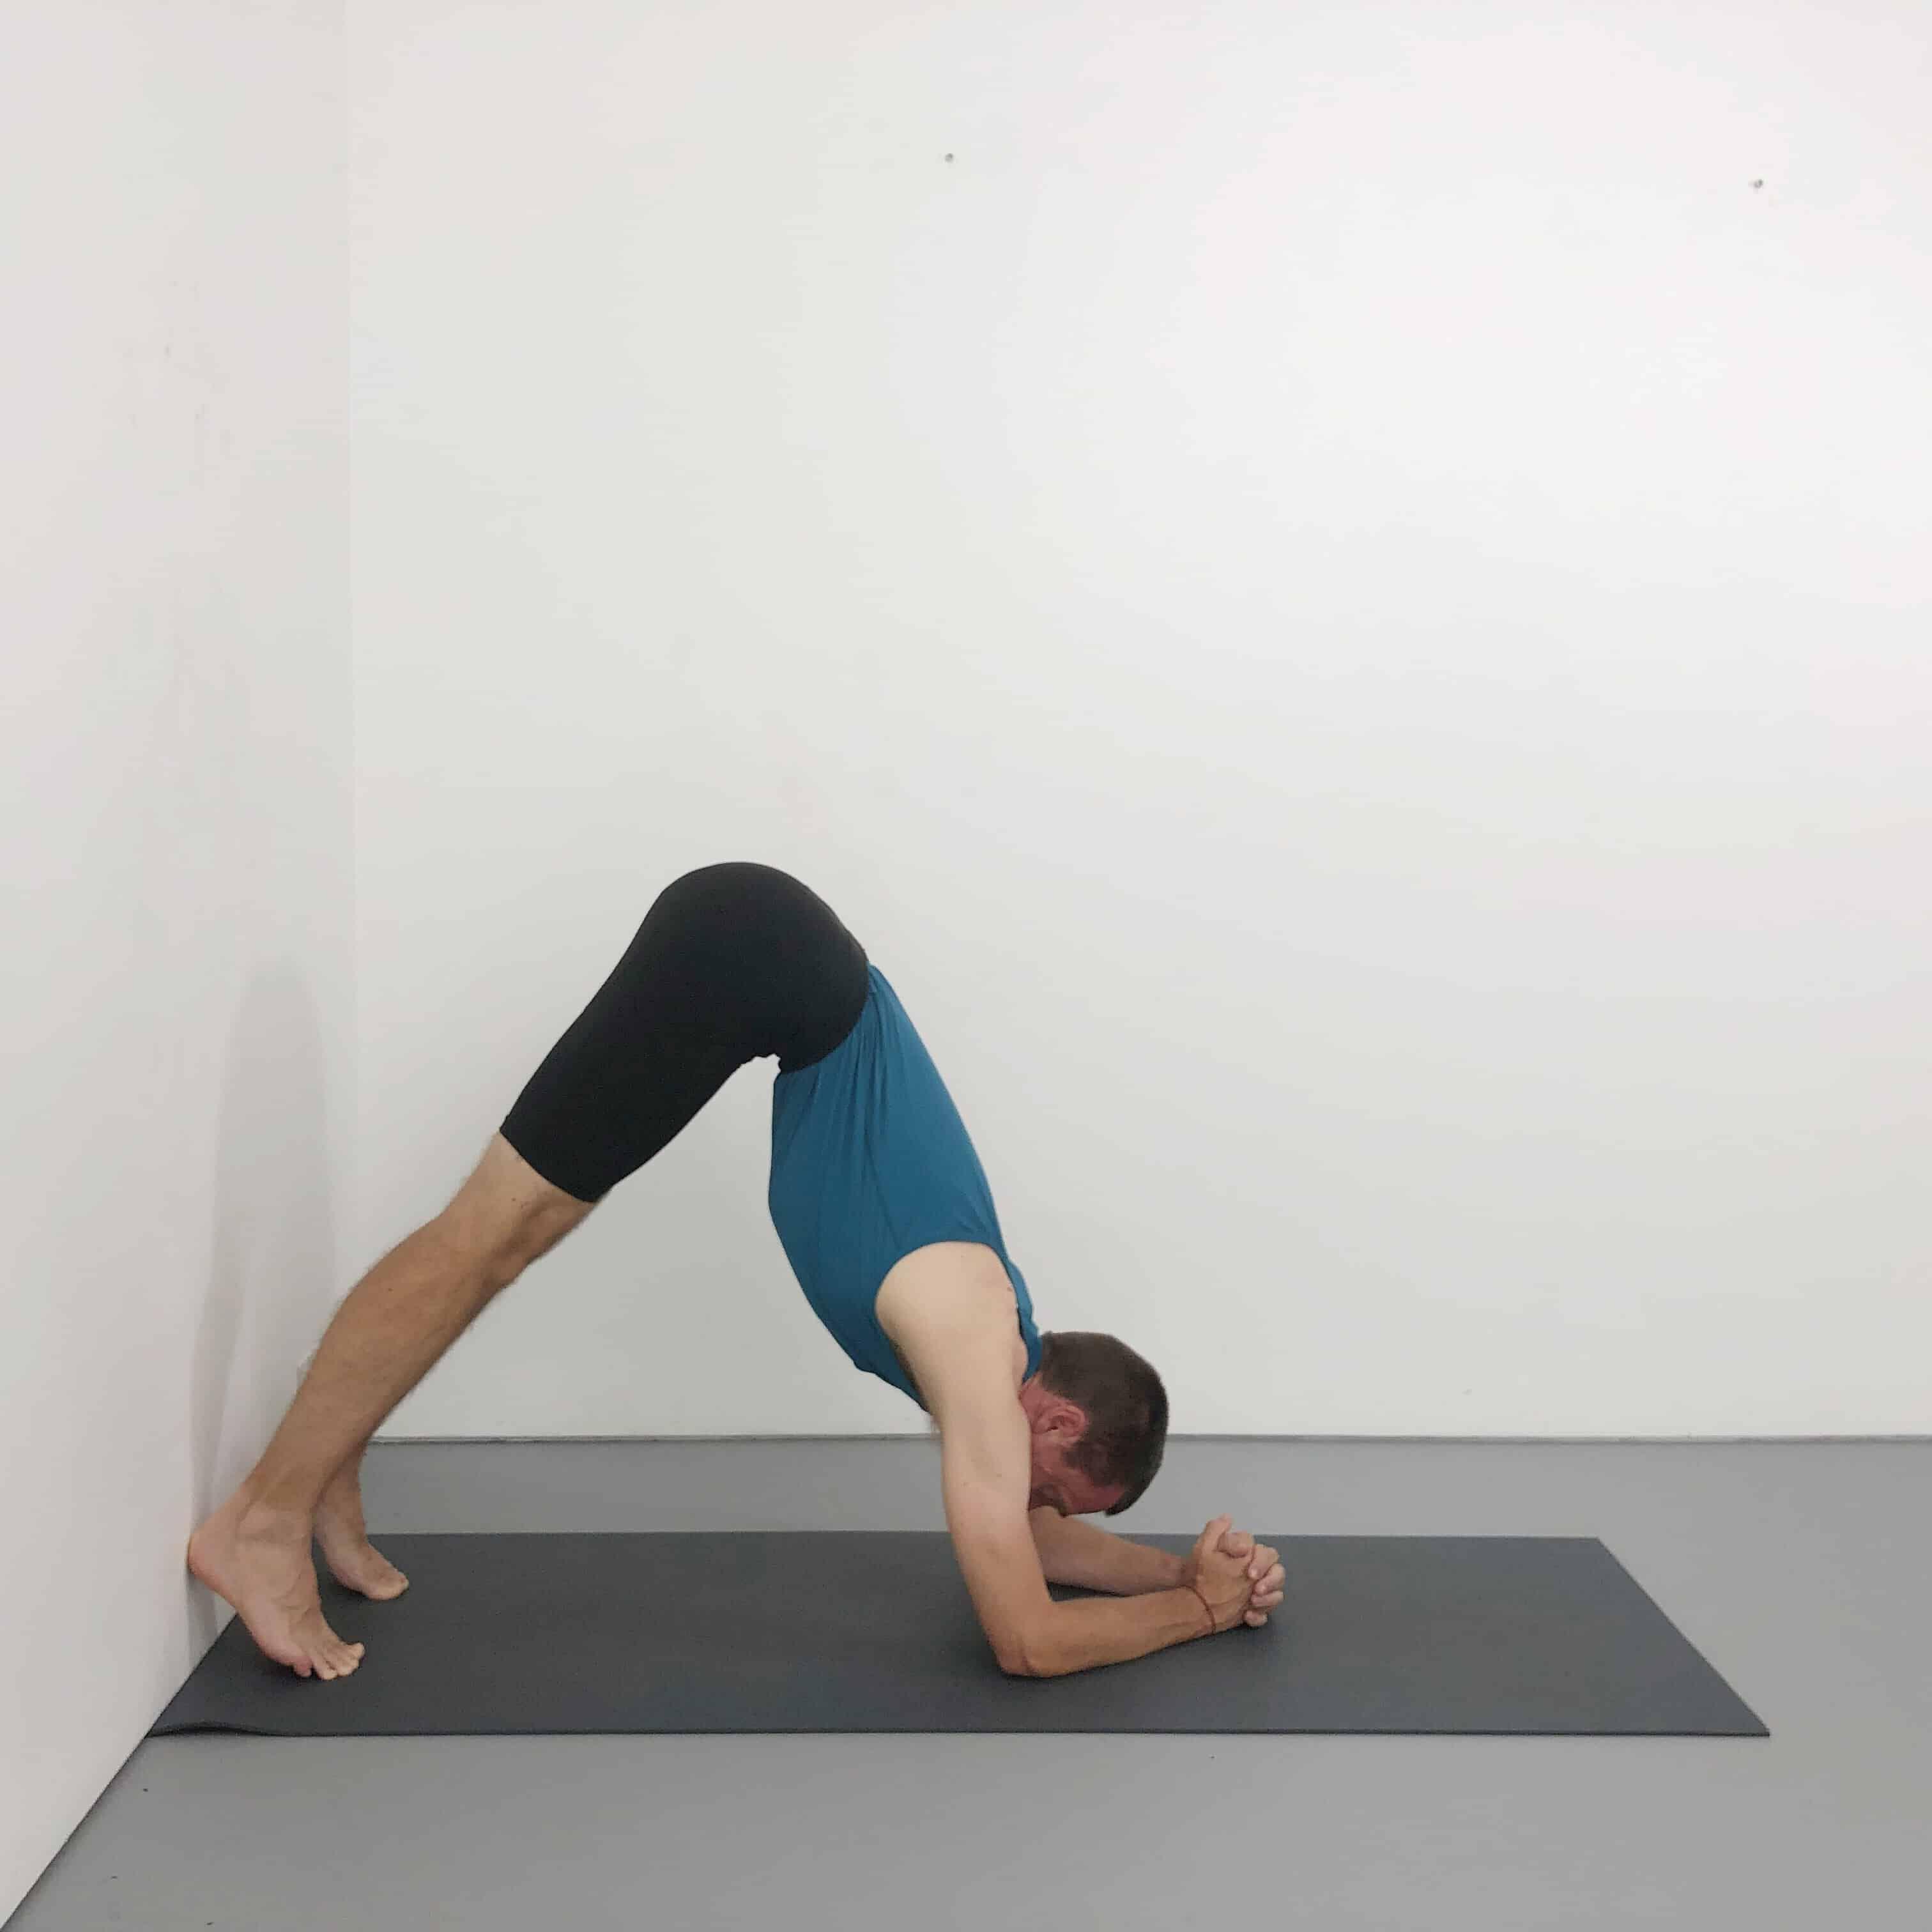 How To Do Sirsasana (Headstand) Step By Step Yoga